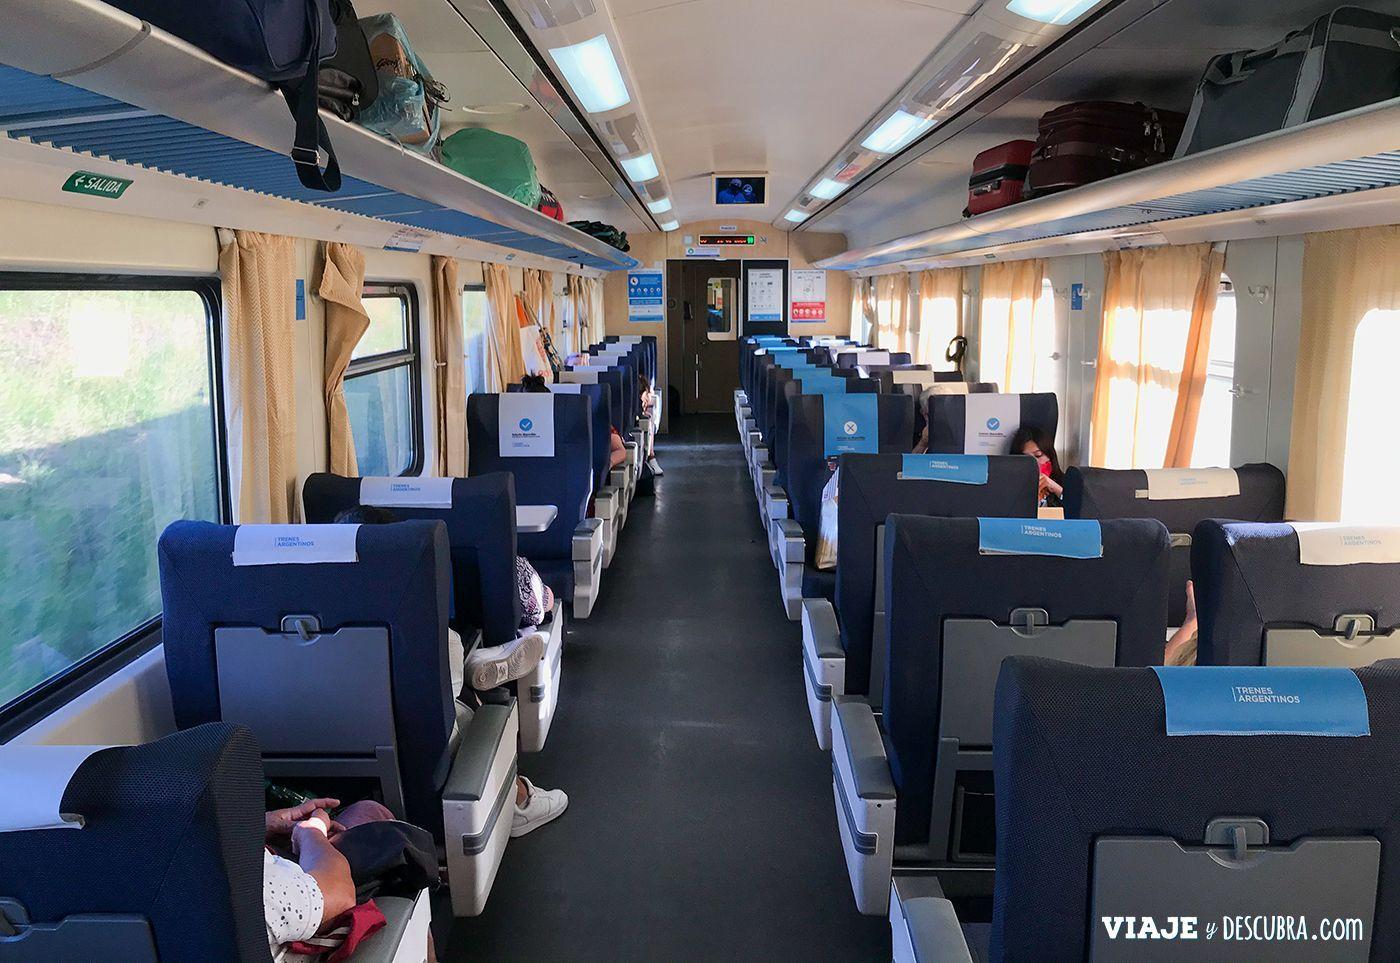 trenes-argentinos,-tren-larga-distancia,-mar-del-plata,-buenos-aires,-categoria-pullman